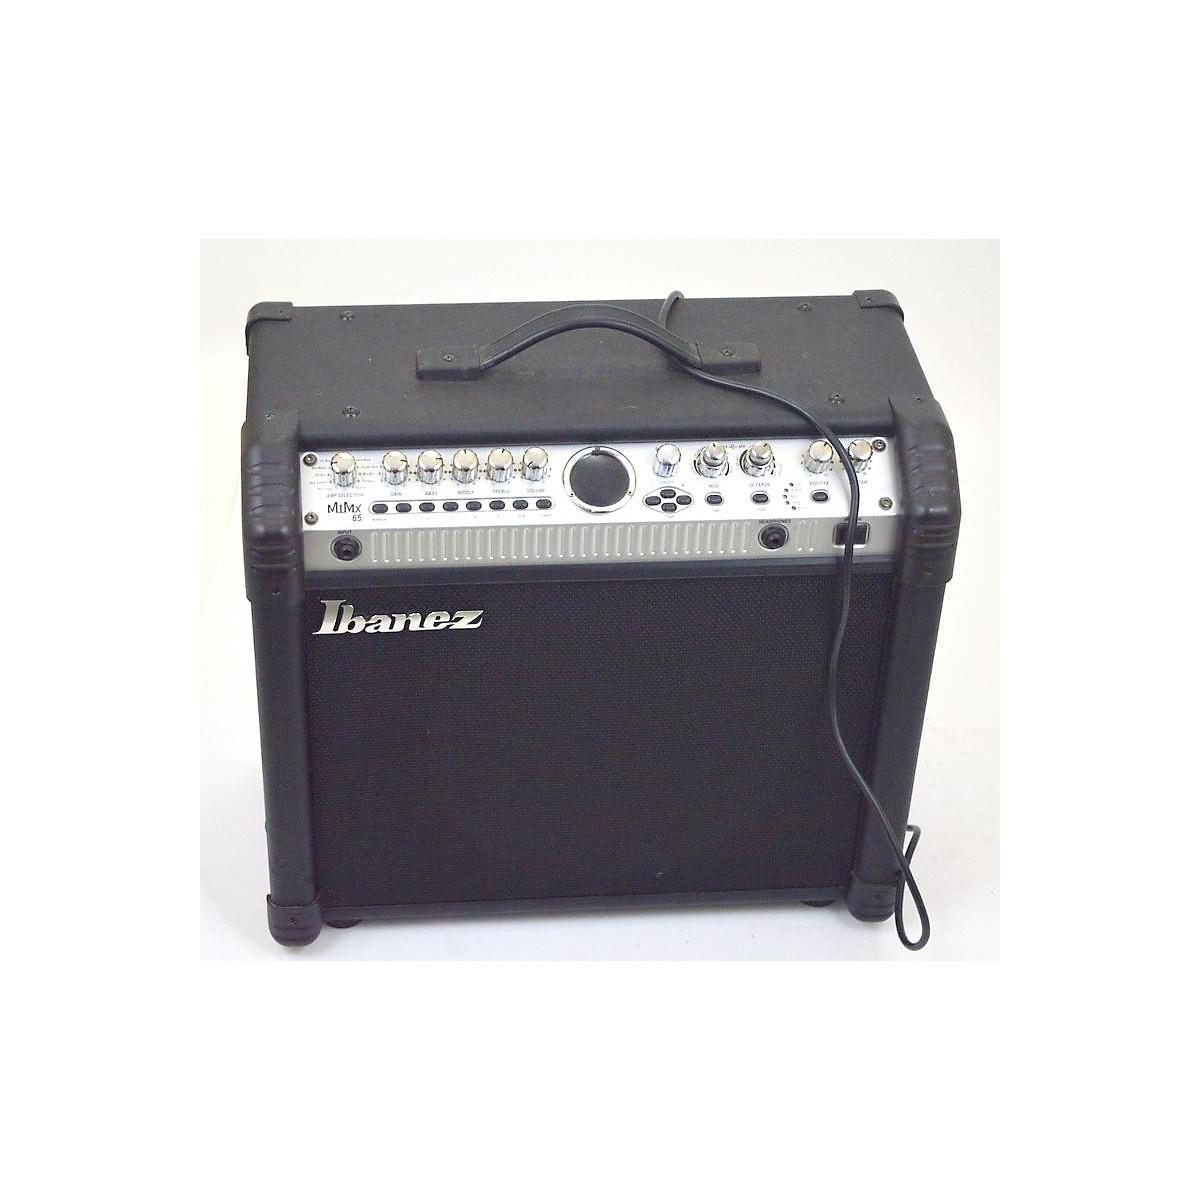 Ibanez MIMX 65 Guitar Combo Amp